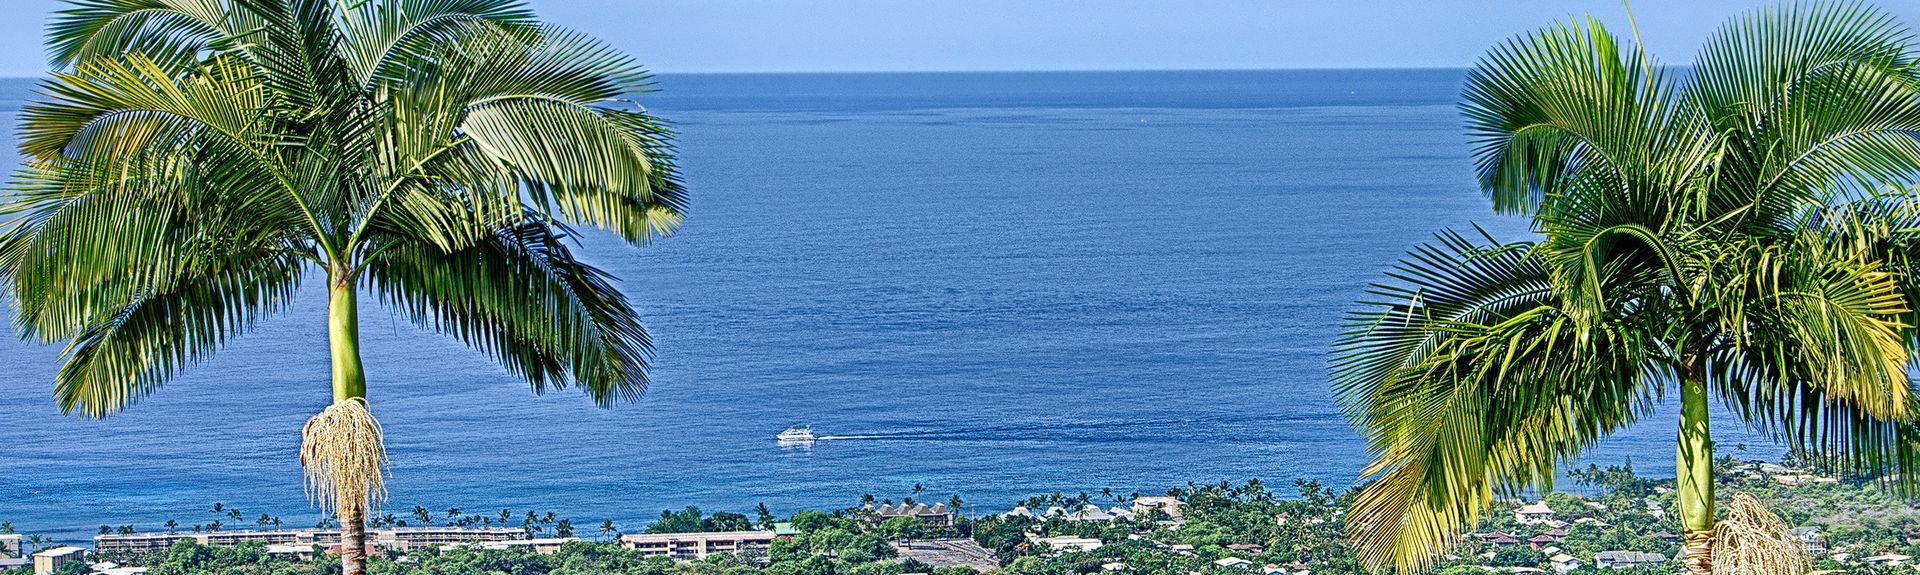 Kua Bay (baie), Kailua-Kona, Hawaï, États-Unis d'Amérique